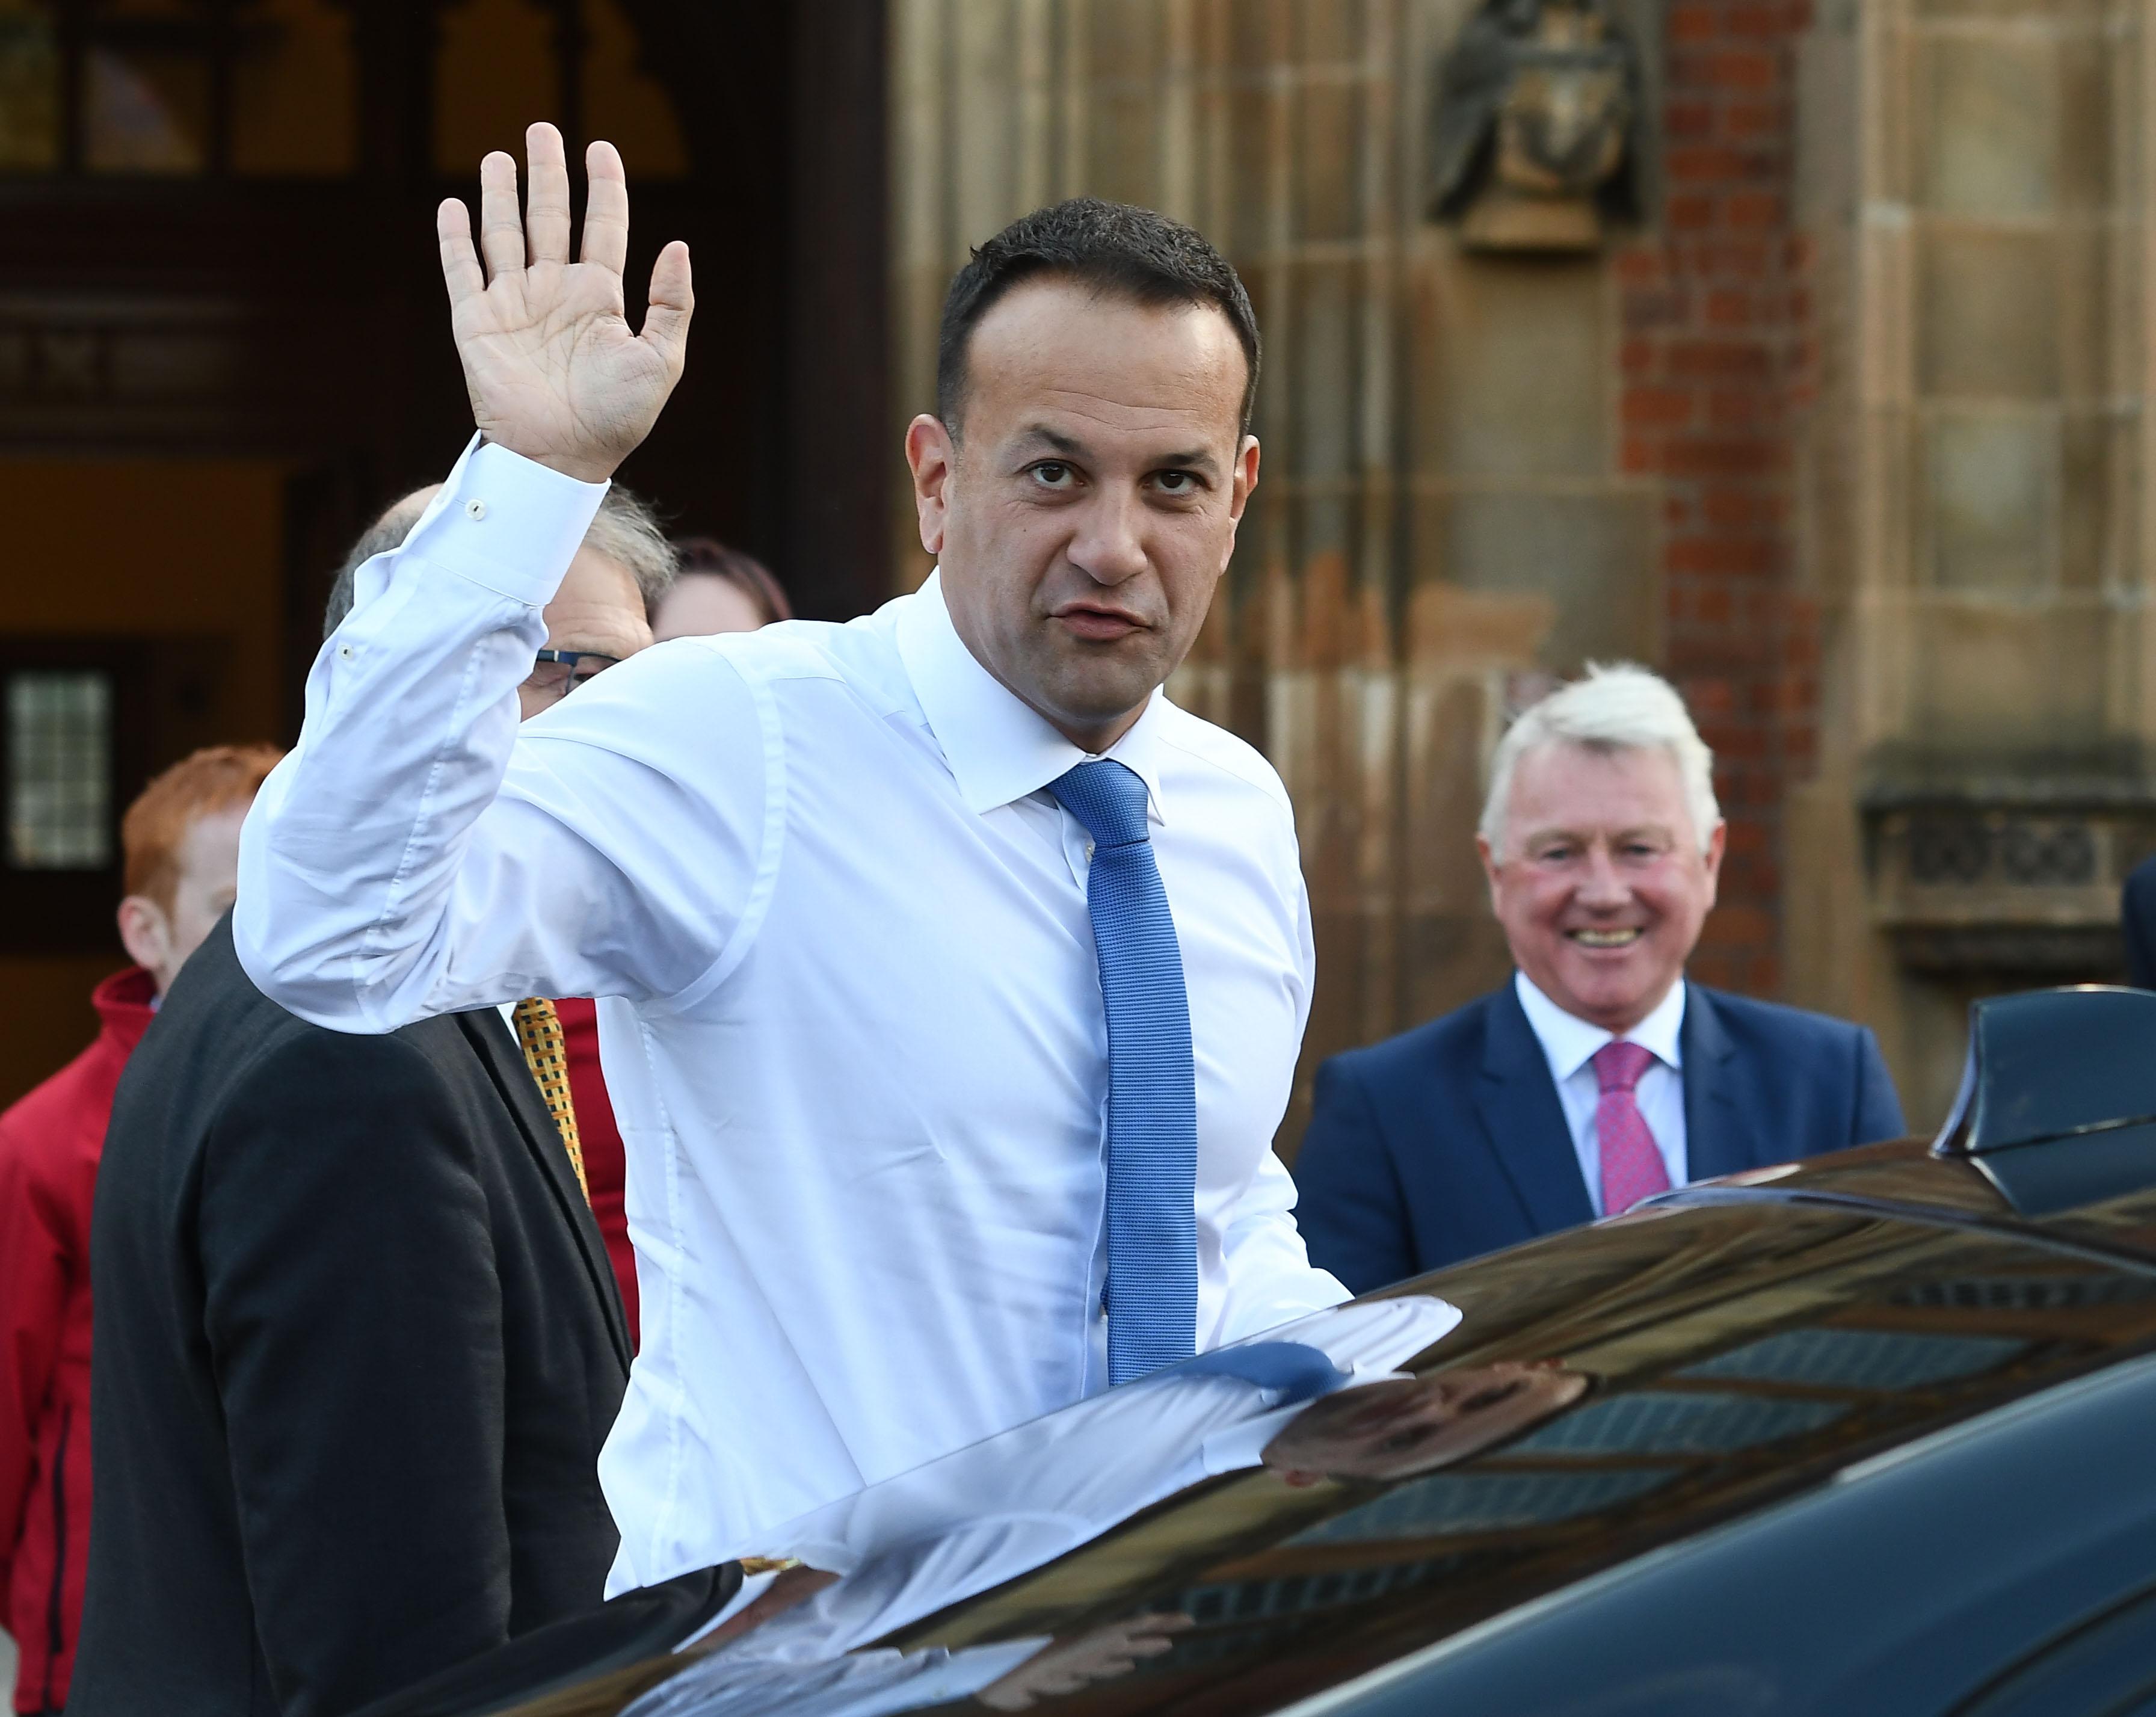 Taoiseach Leo Varadkar will be in West Belfast on Friday